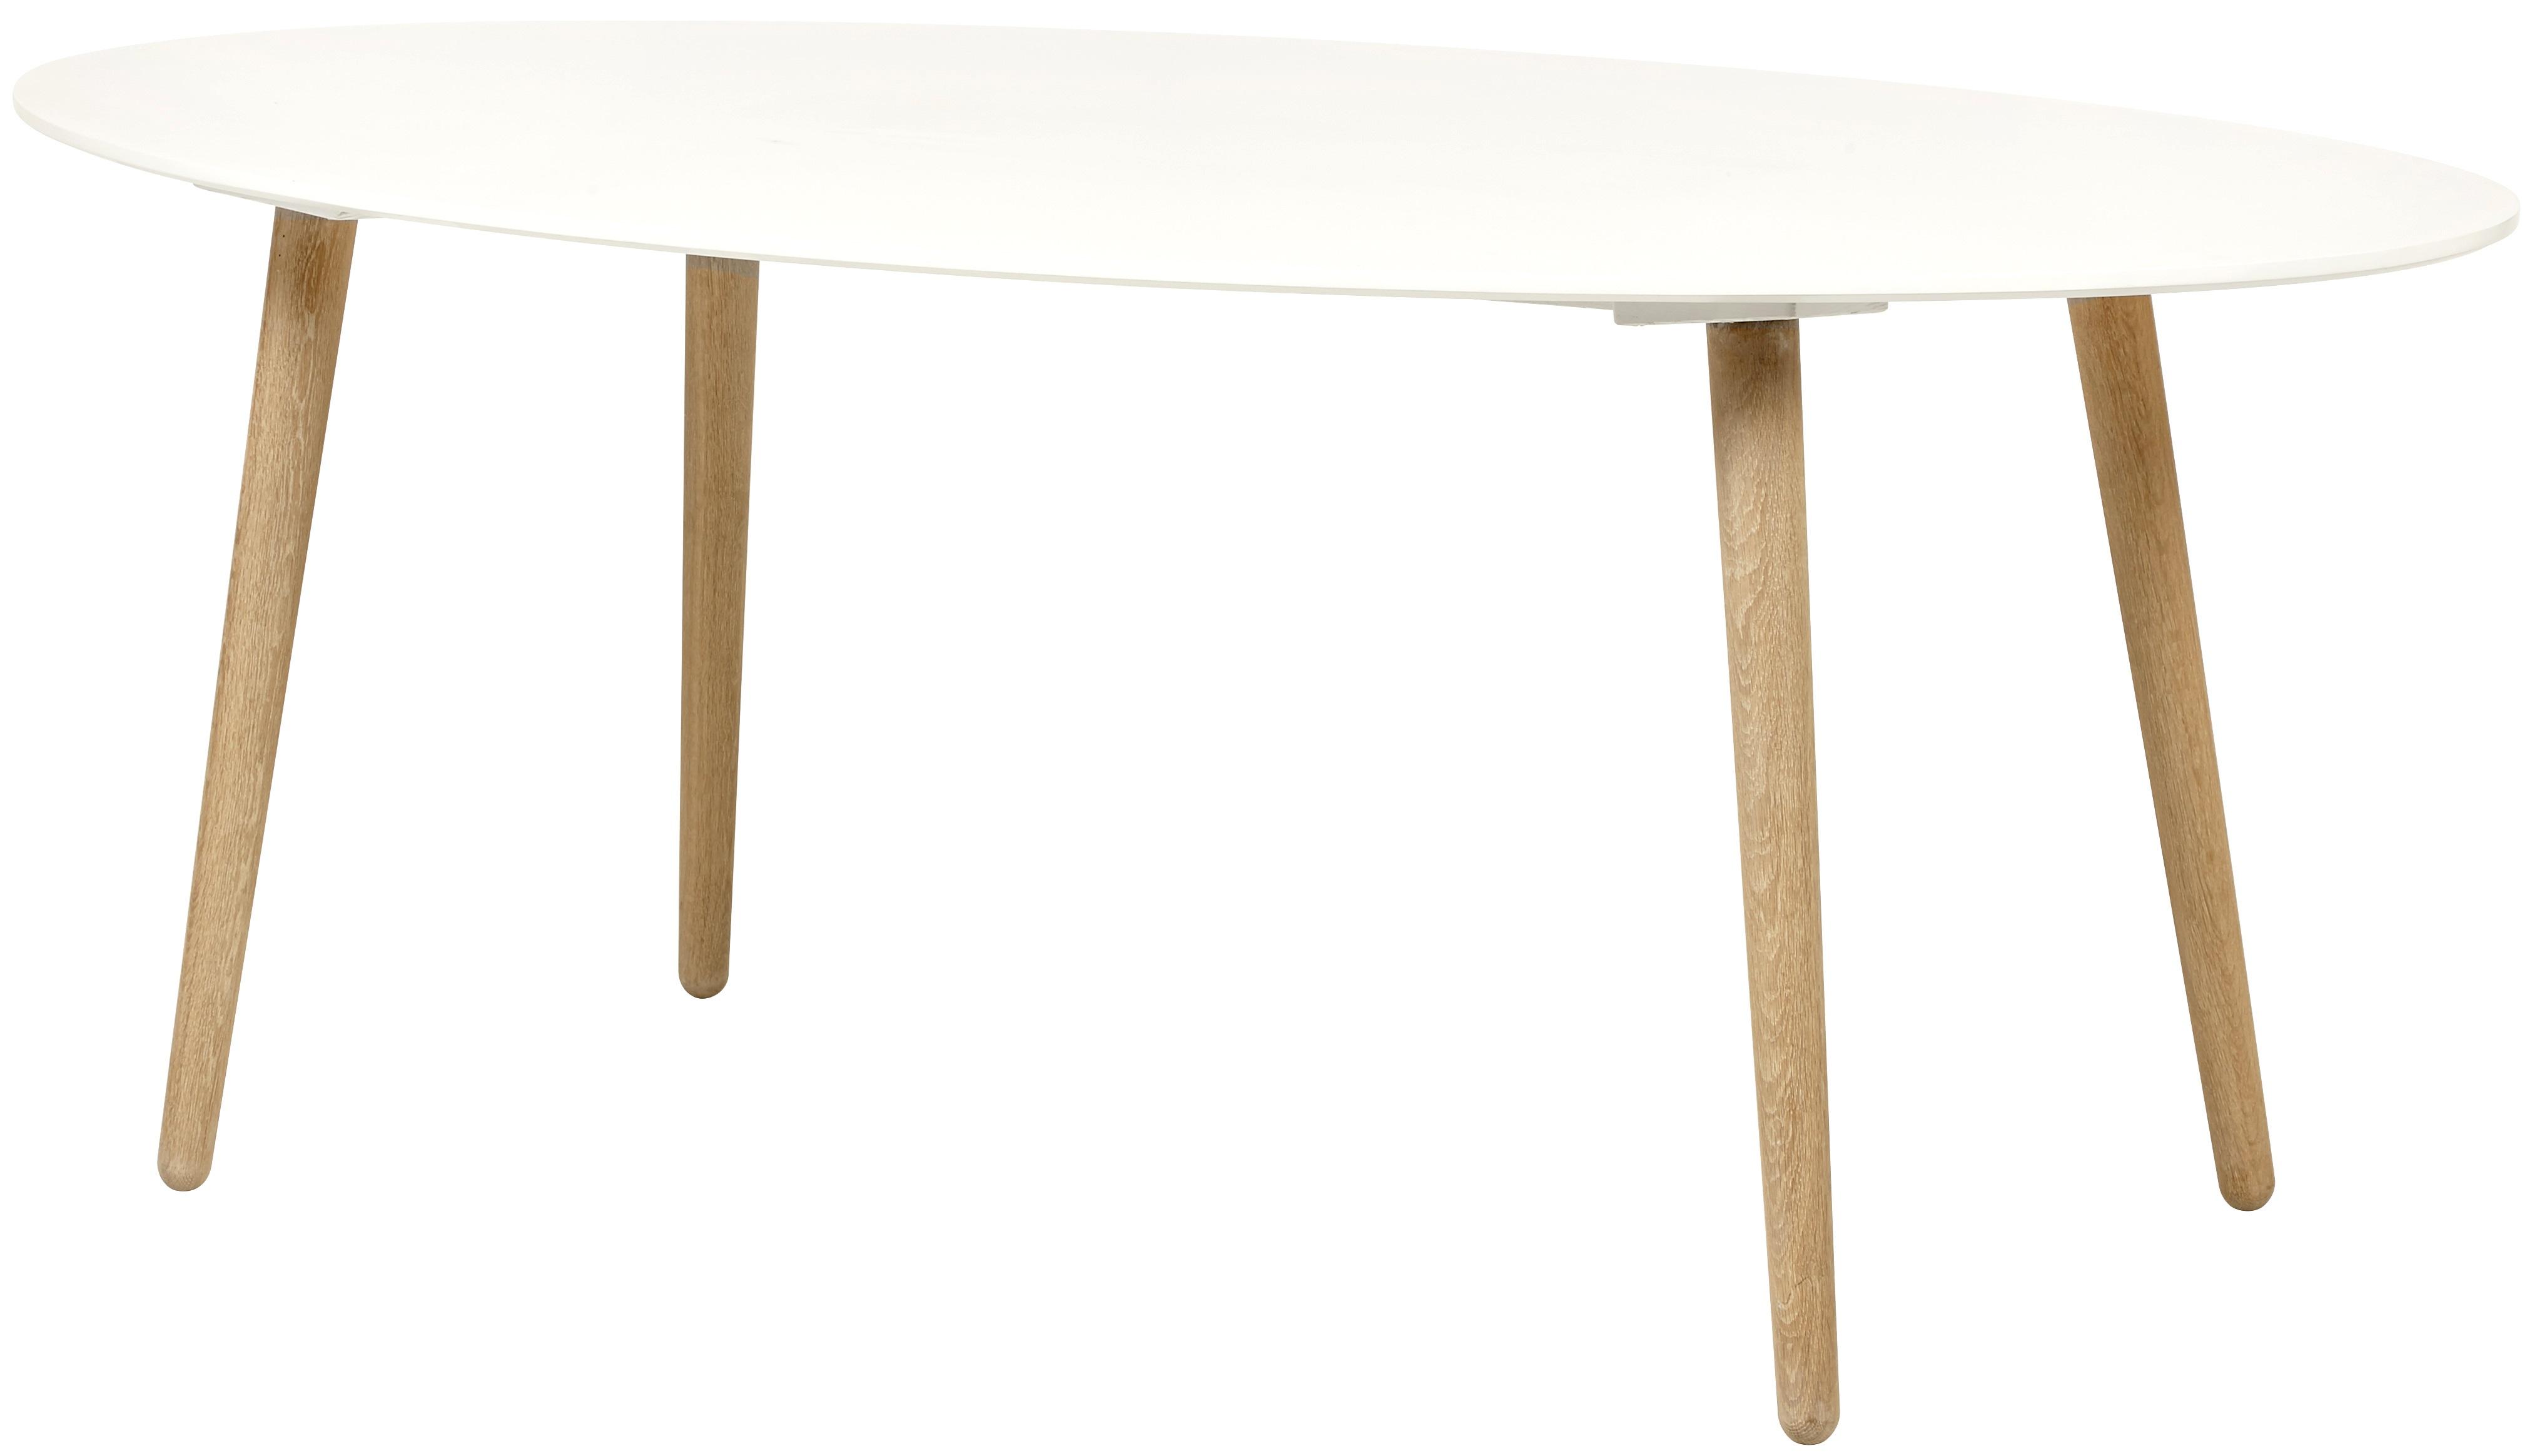 Matbord Whitewash : Vita matbord finns på pricepi